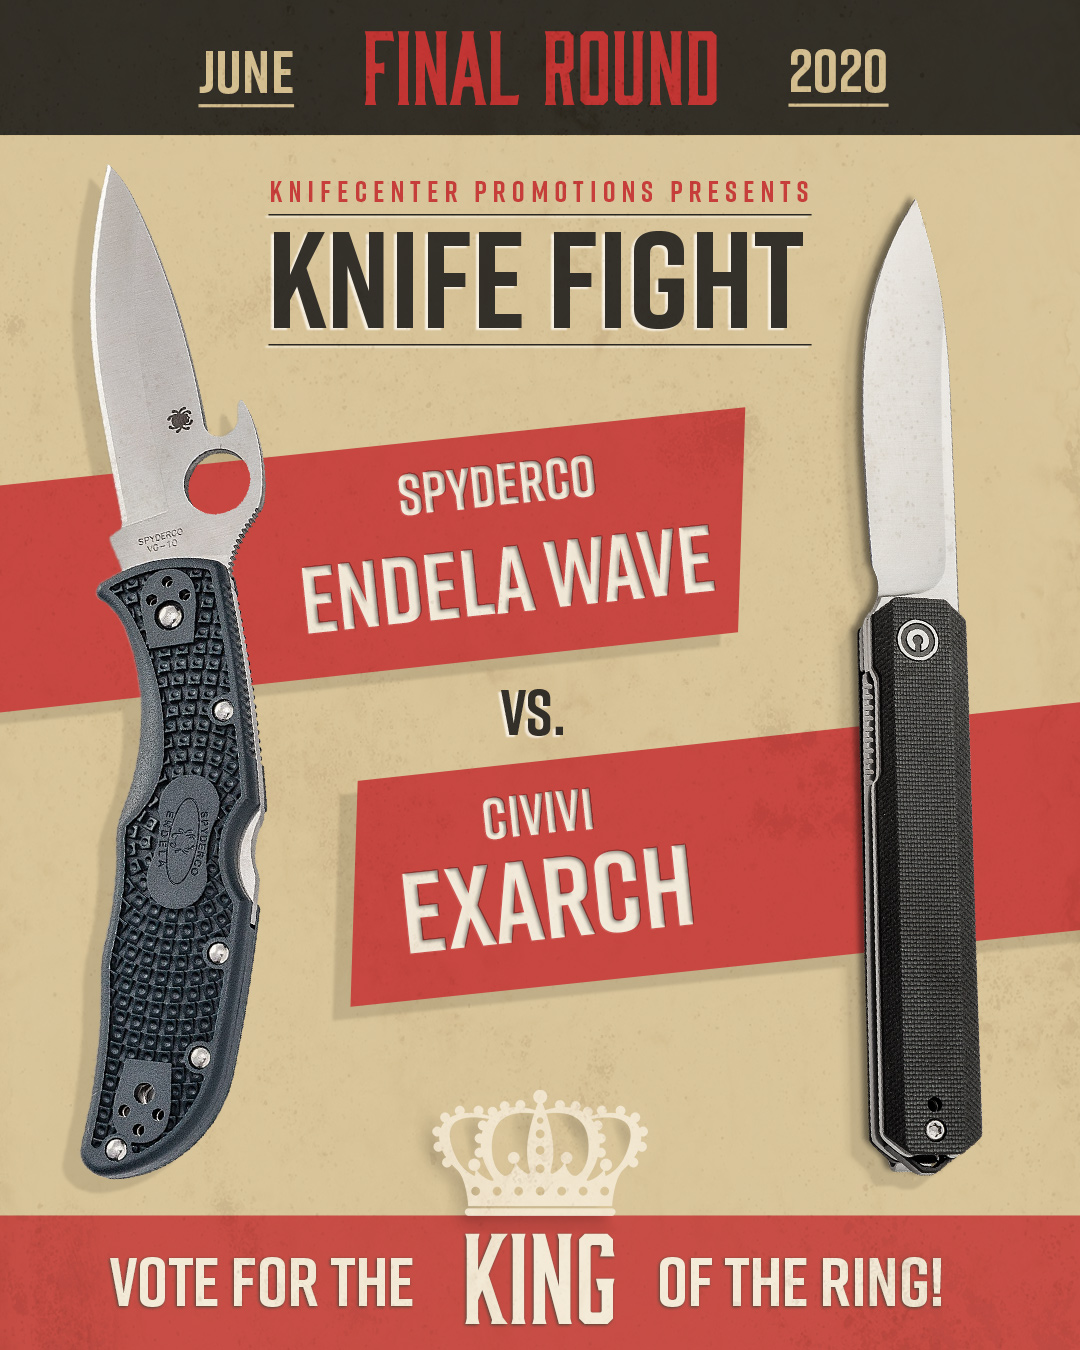 Spyderco Endela Wave vs. Civivi Exarch